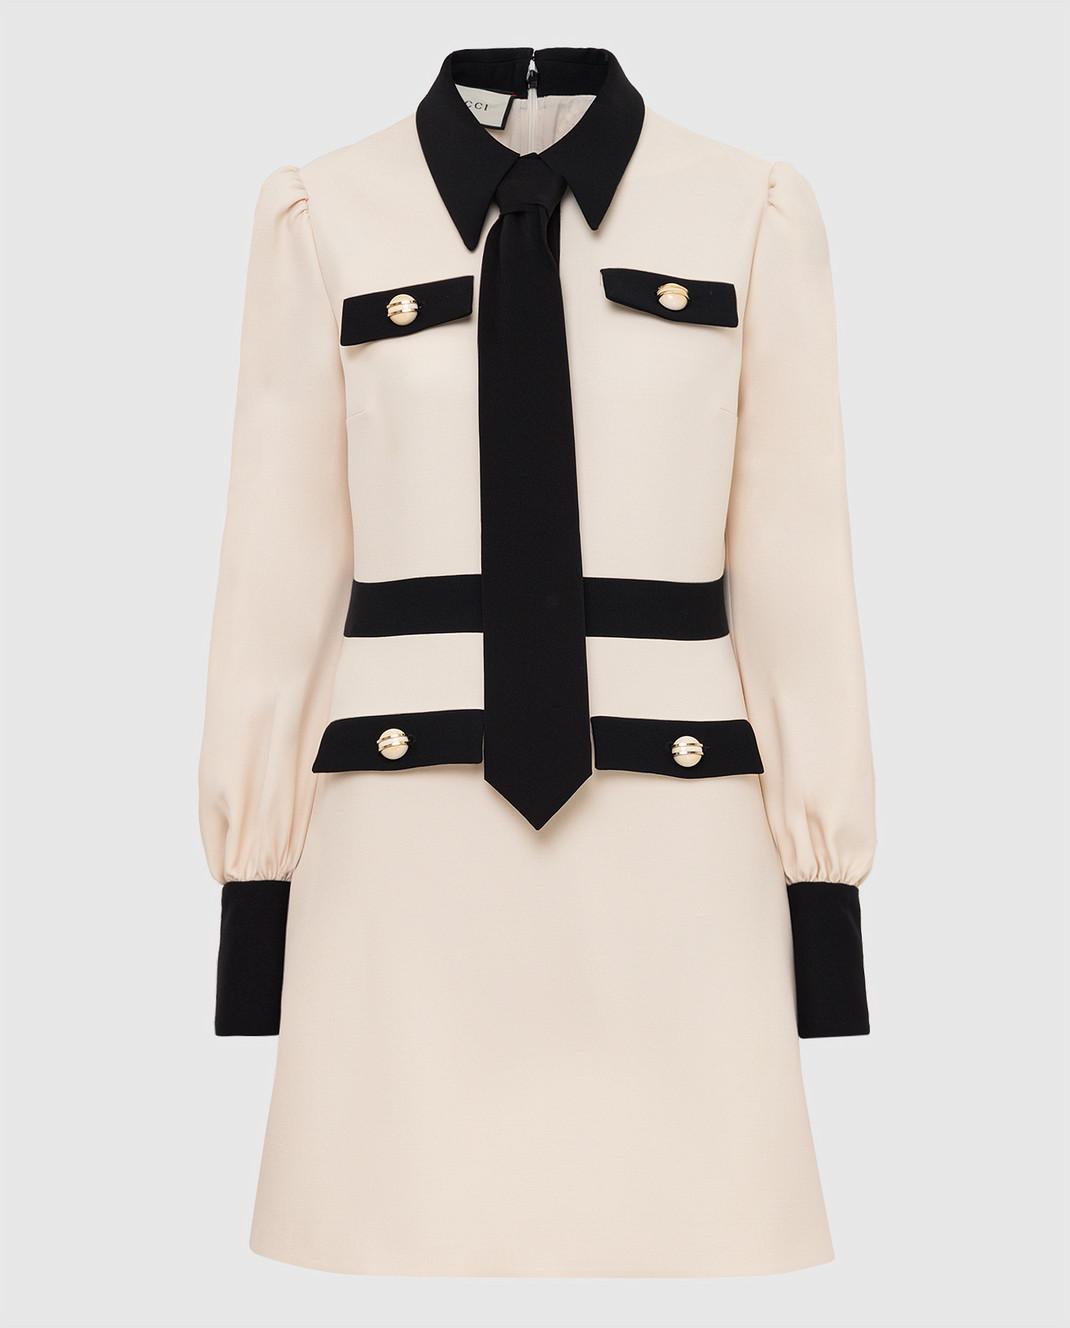 Gucci Светло-бежевое платье 595257